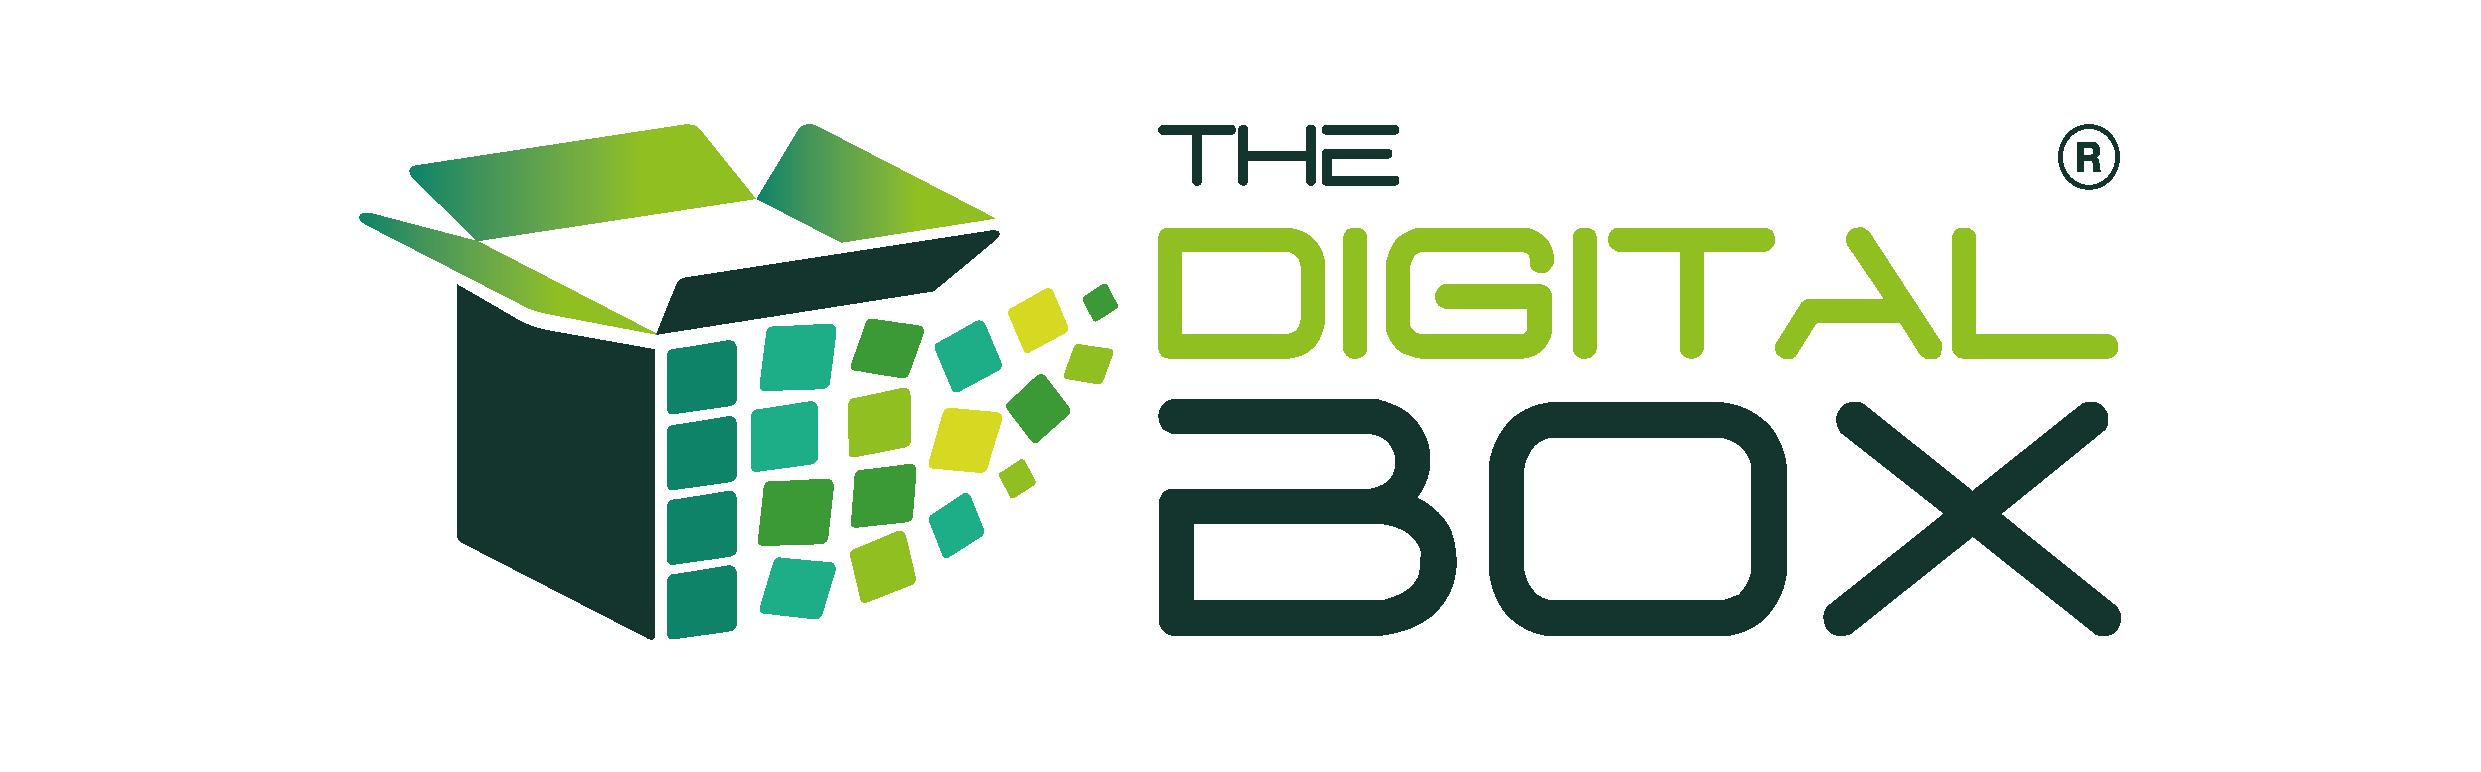 digitalbox via internet